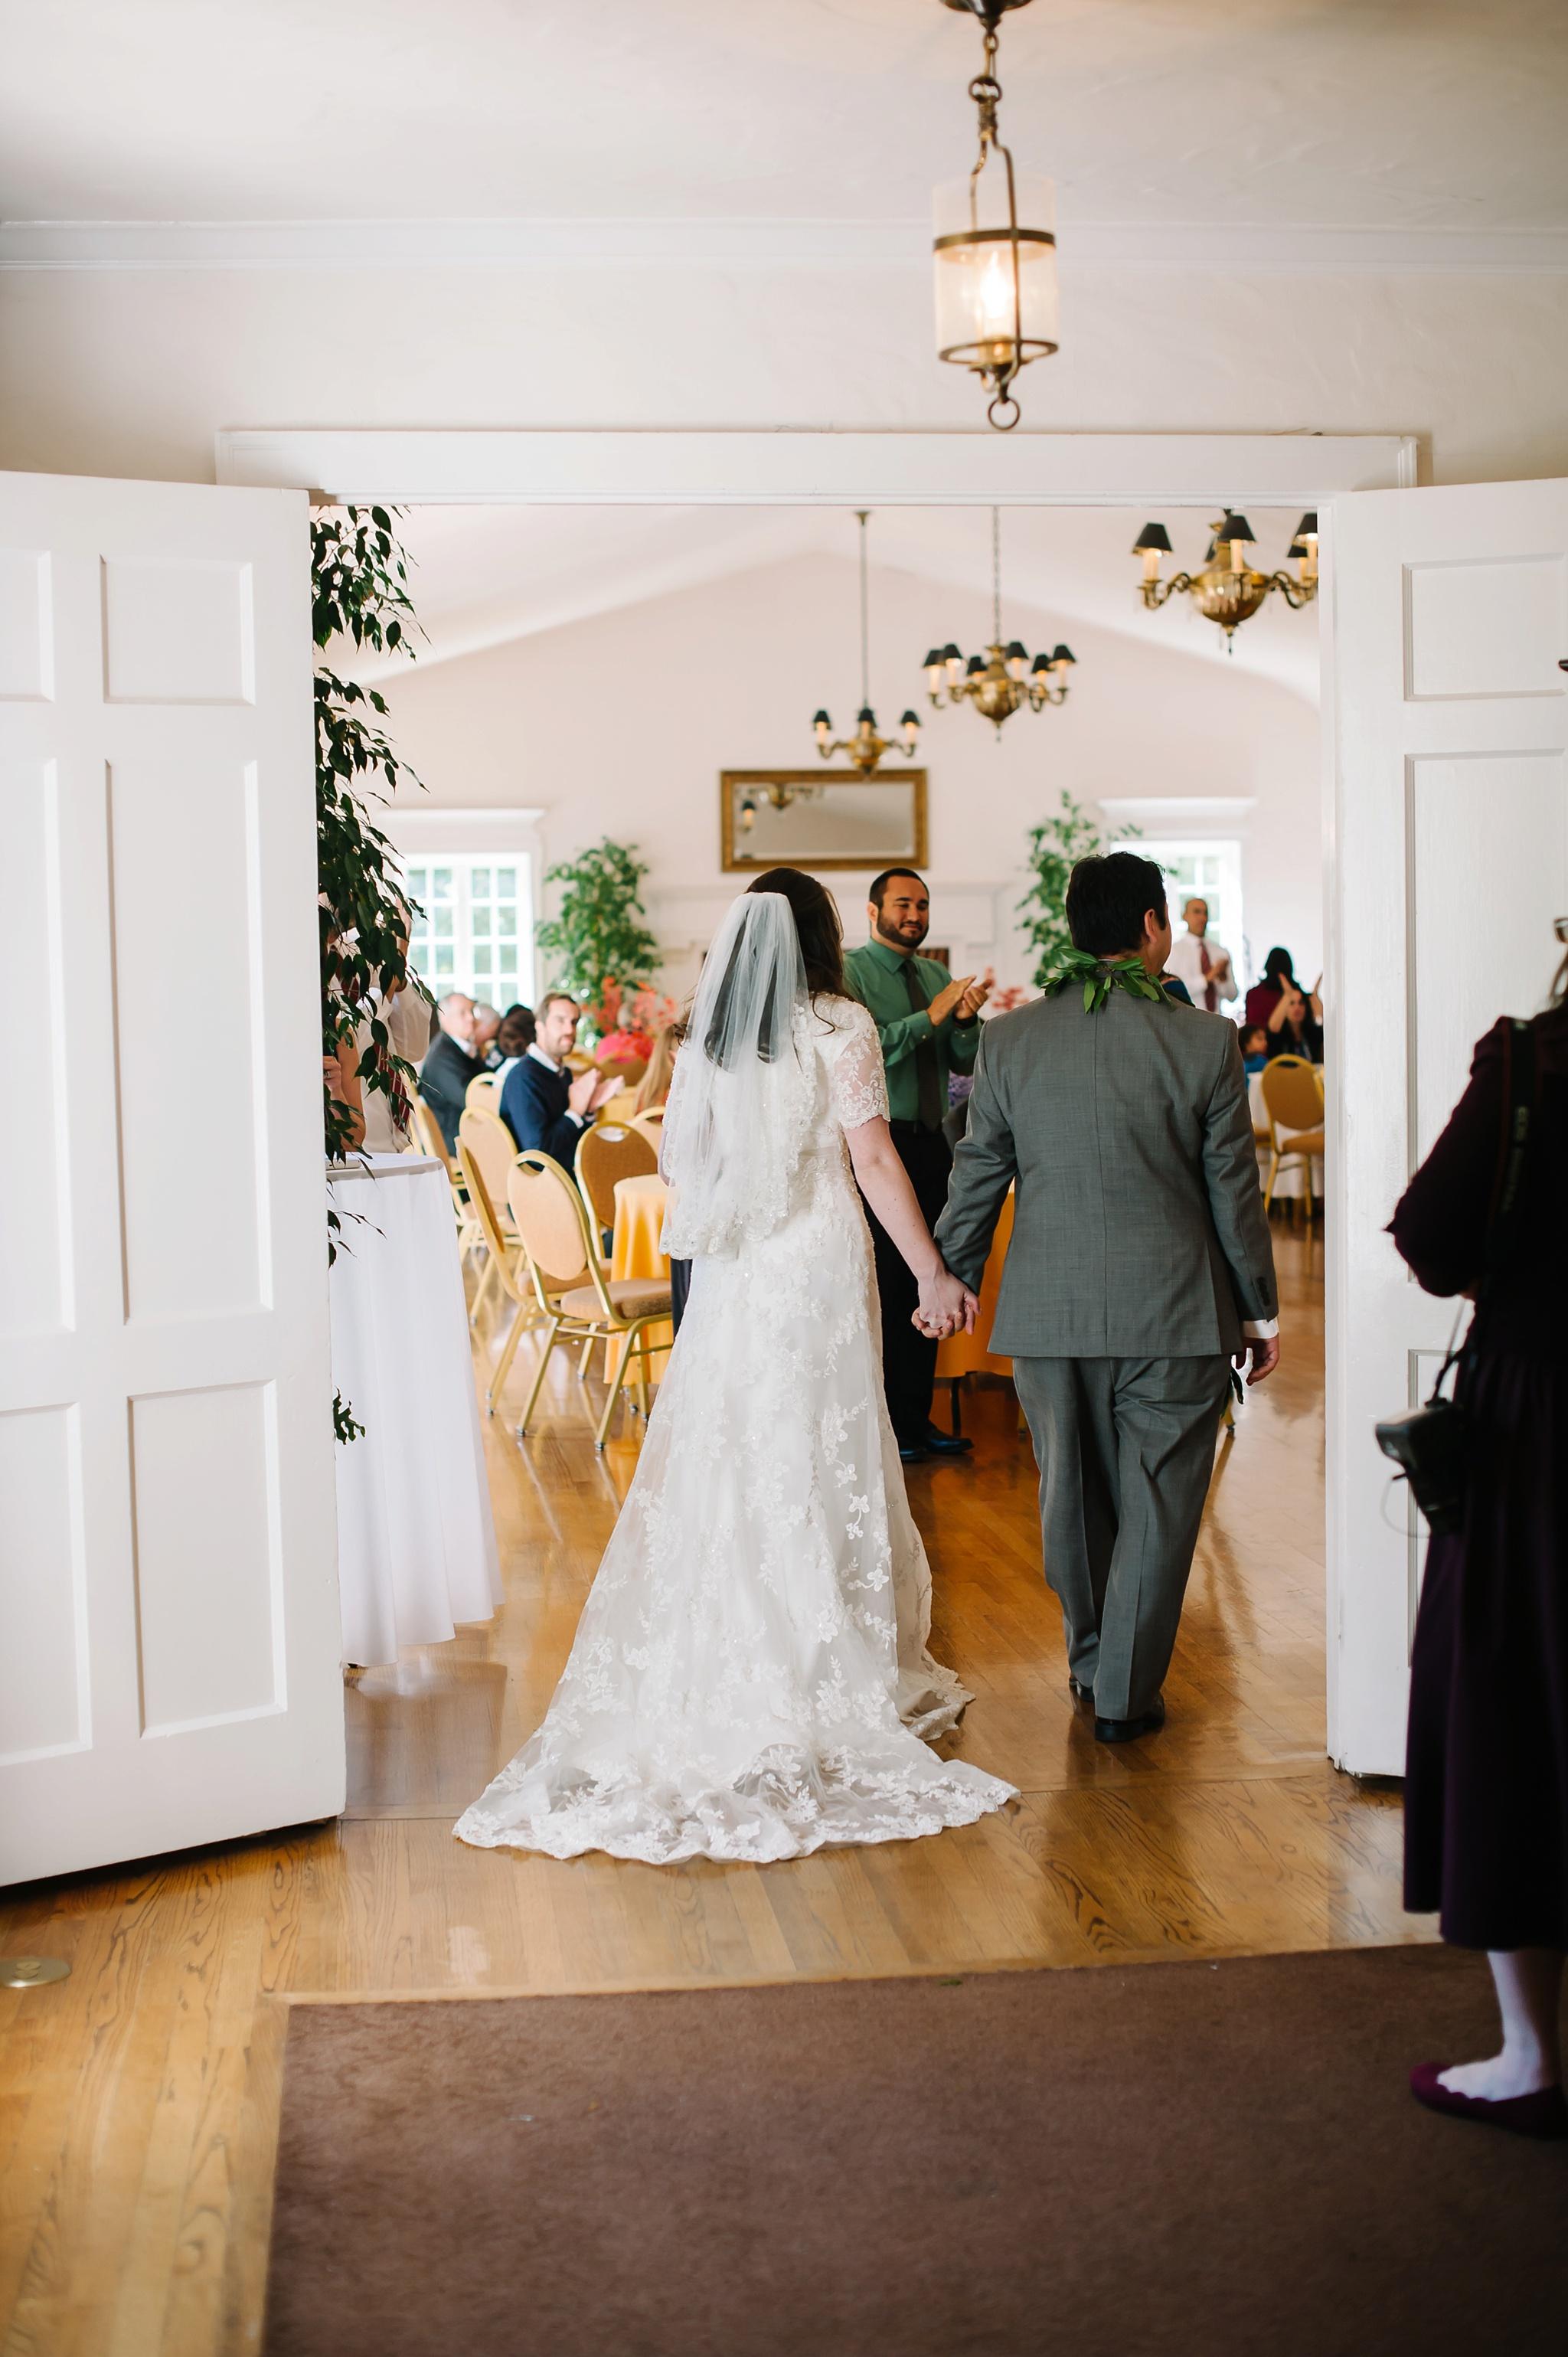 Park City Wedding Photographer Ali Sumsion 069